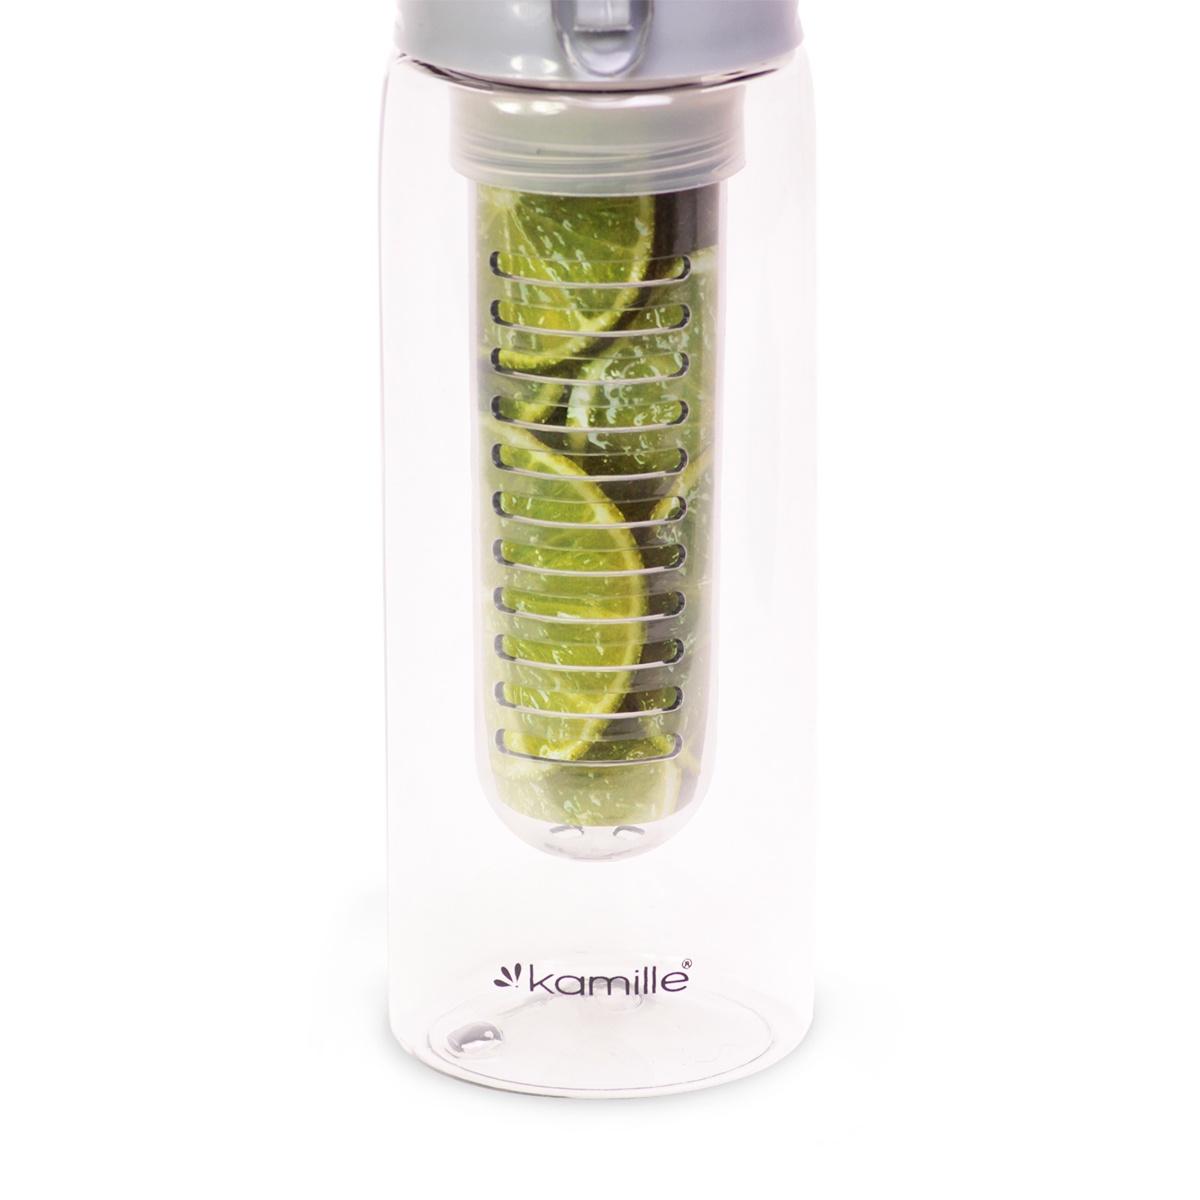 Фото - Бутылка спортивная для воды KAMILLE пластик-тритан спортивная бутылка tomimitsu 1066 fga1066 1000